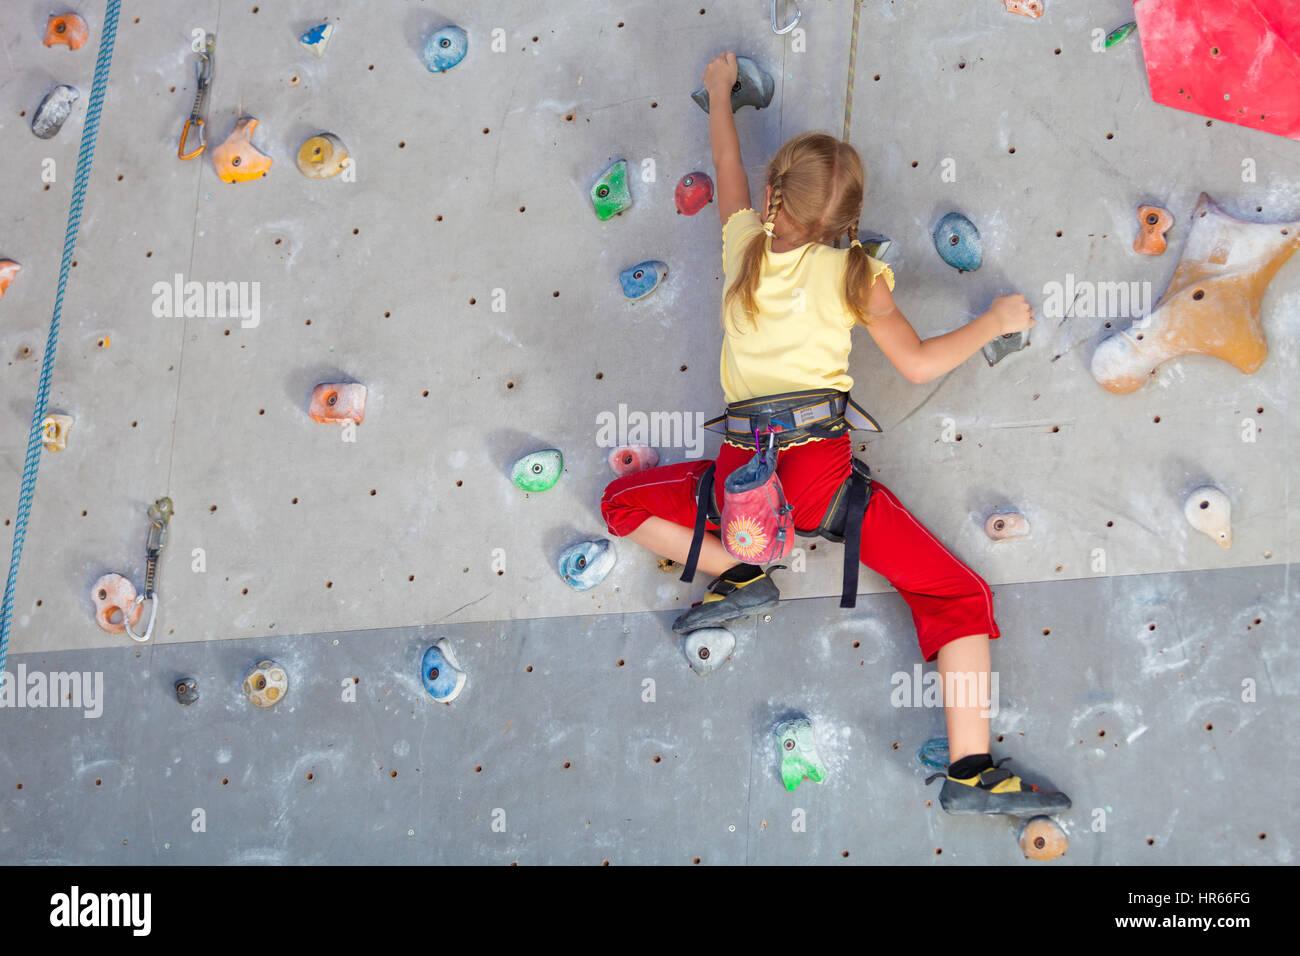 little girl climbing a rock wall indoor - Stock Image